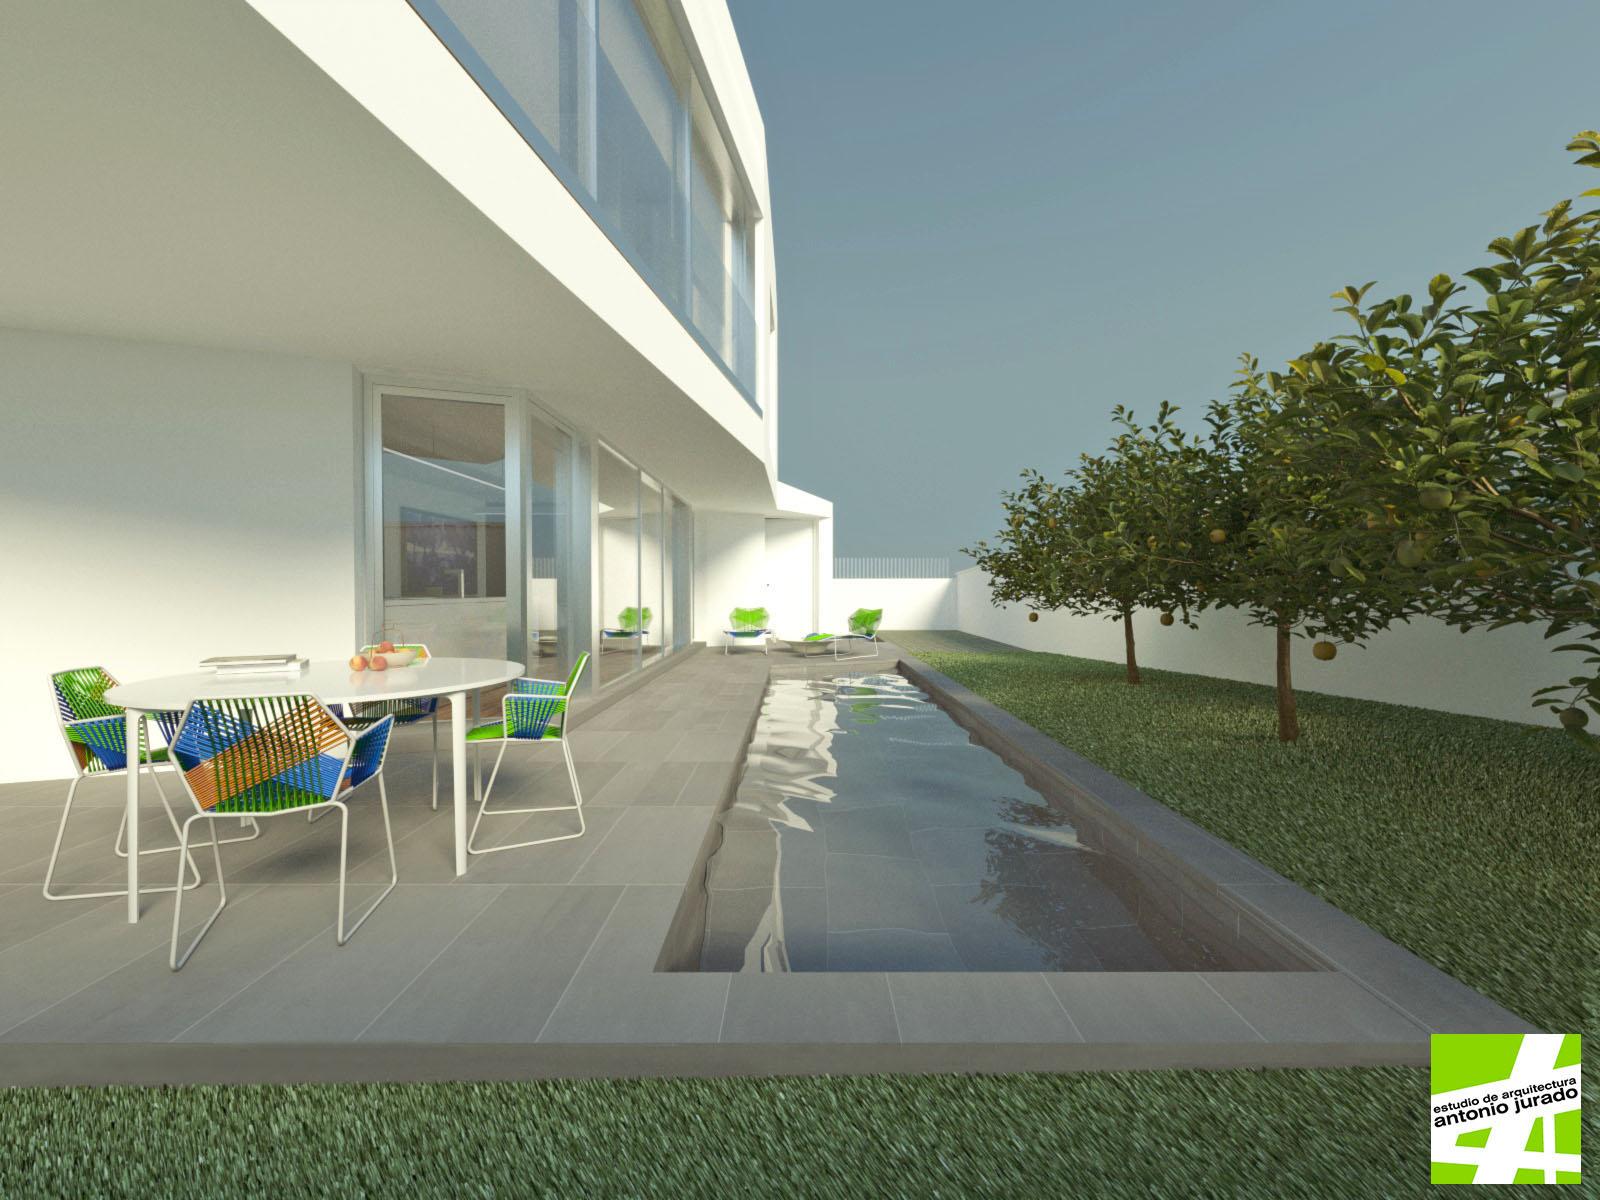 casa-ob-house-alhaurin-malaga-arquitecto-antonio-jurado-04